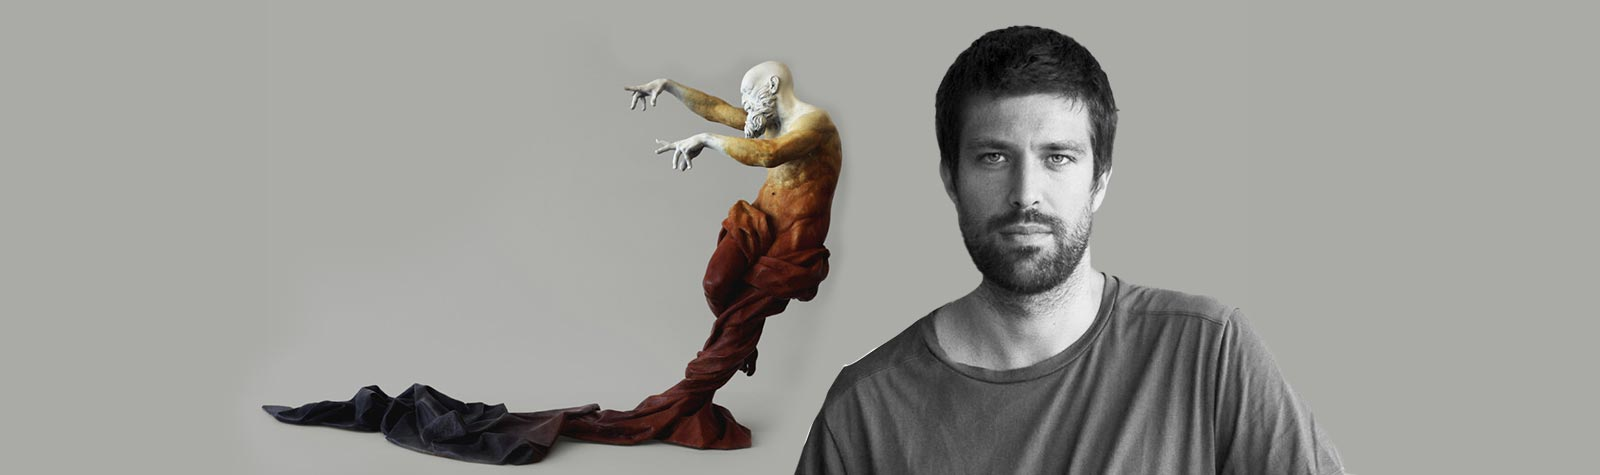 Cesar Orrico: esculturas con una gran fuerza expresiva